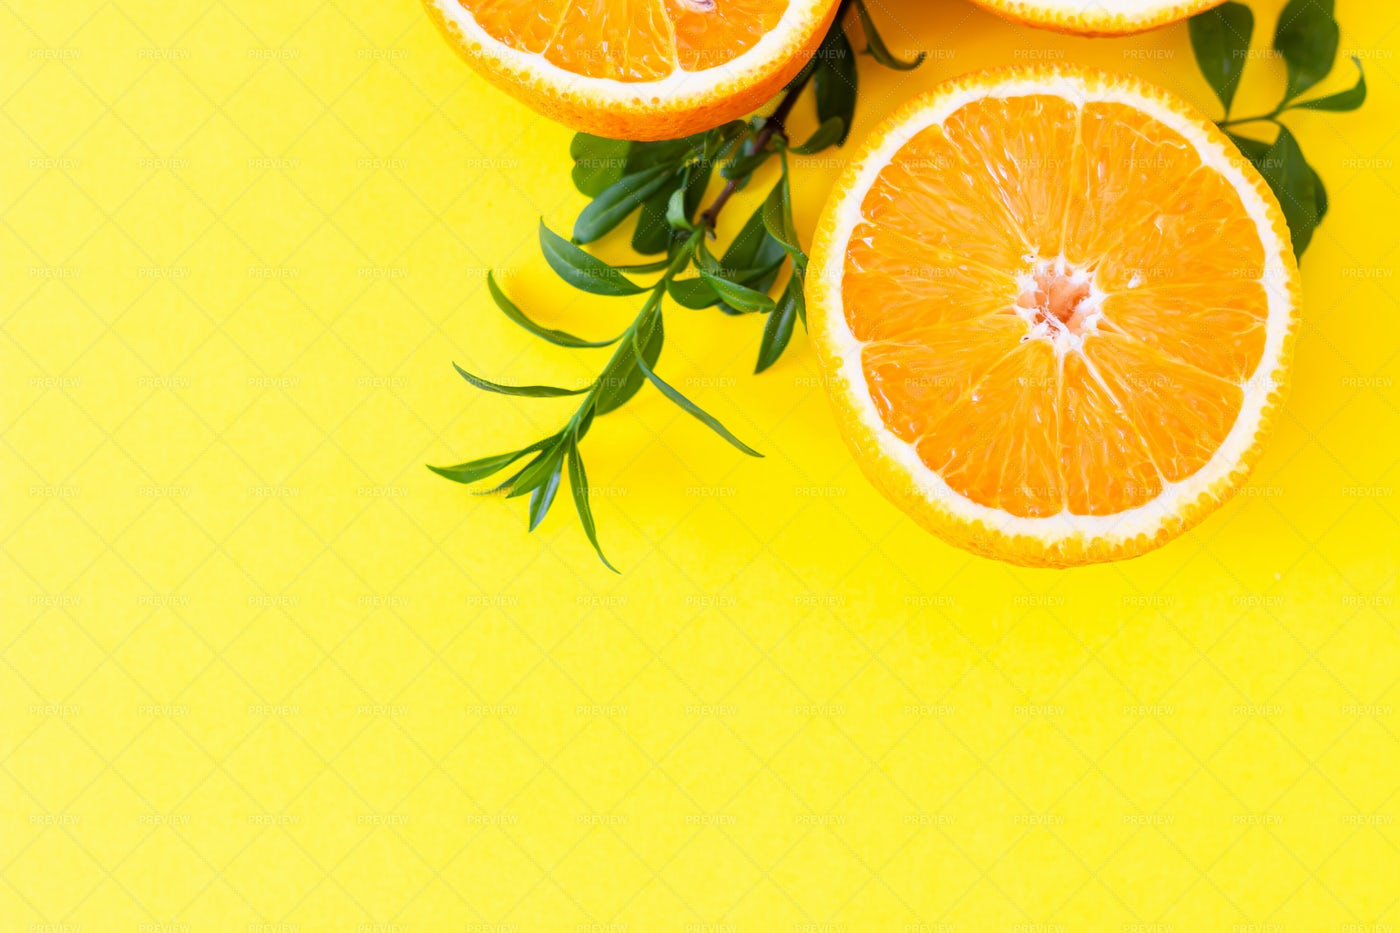 Fresh Orange With Leaves: Stock Photos